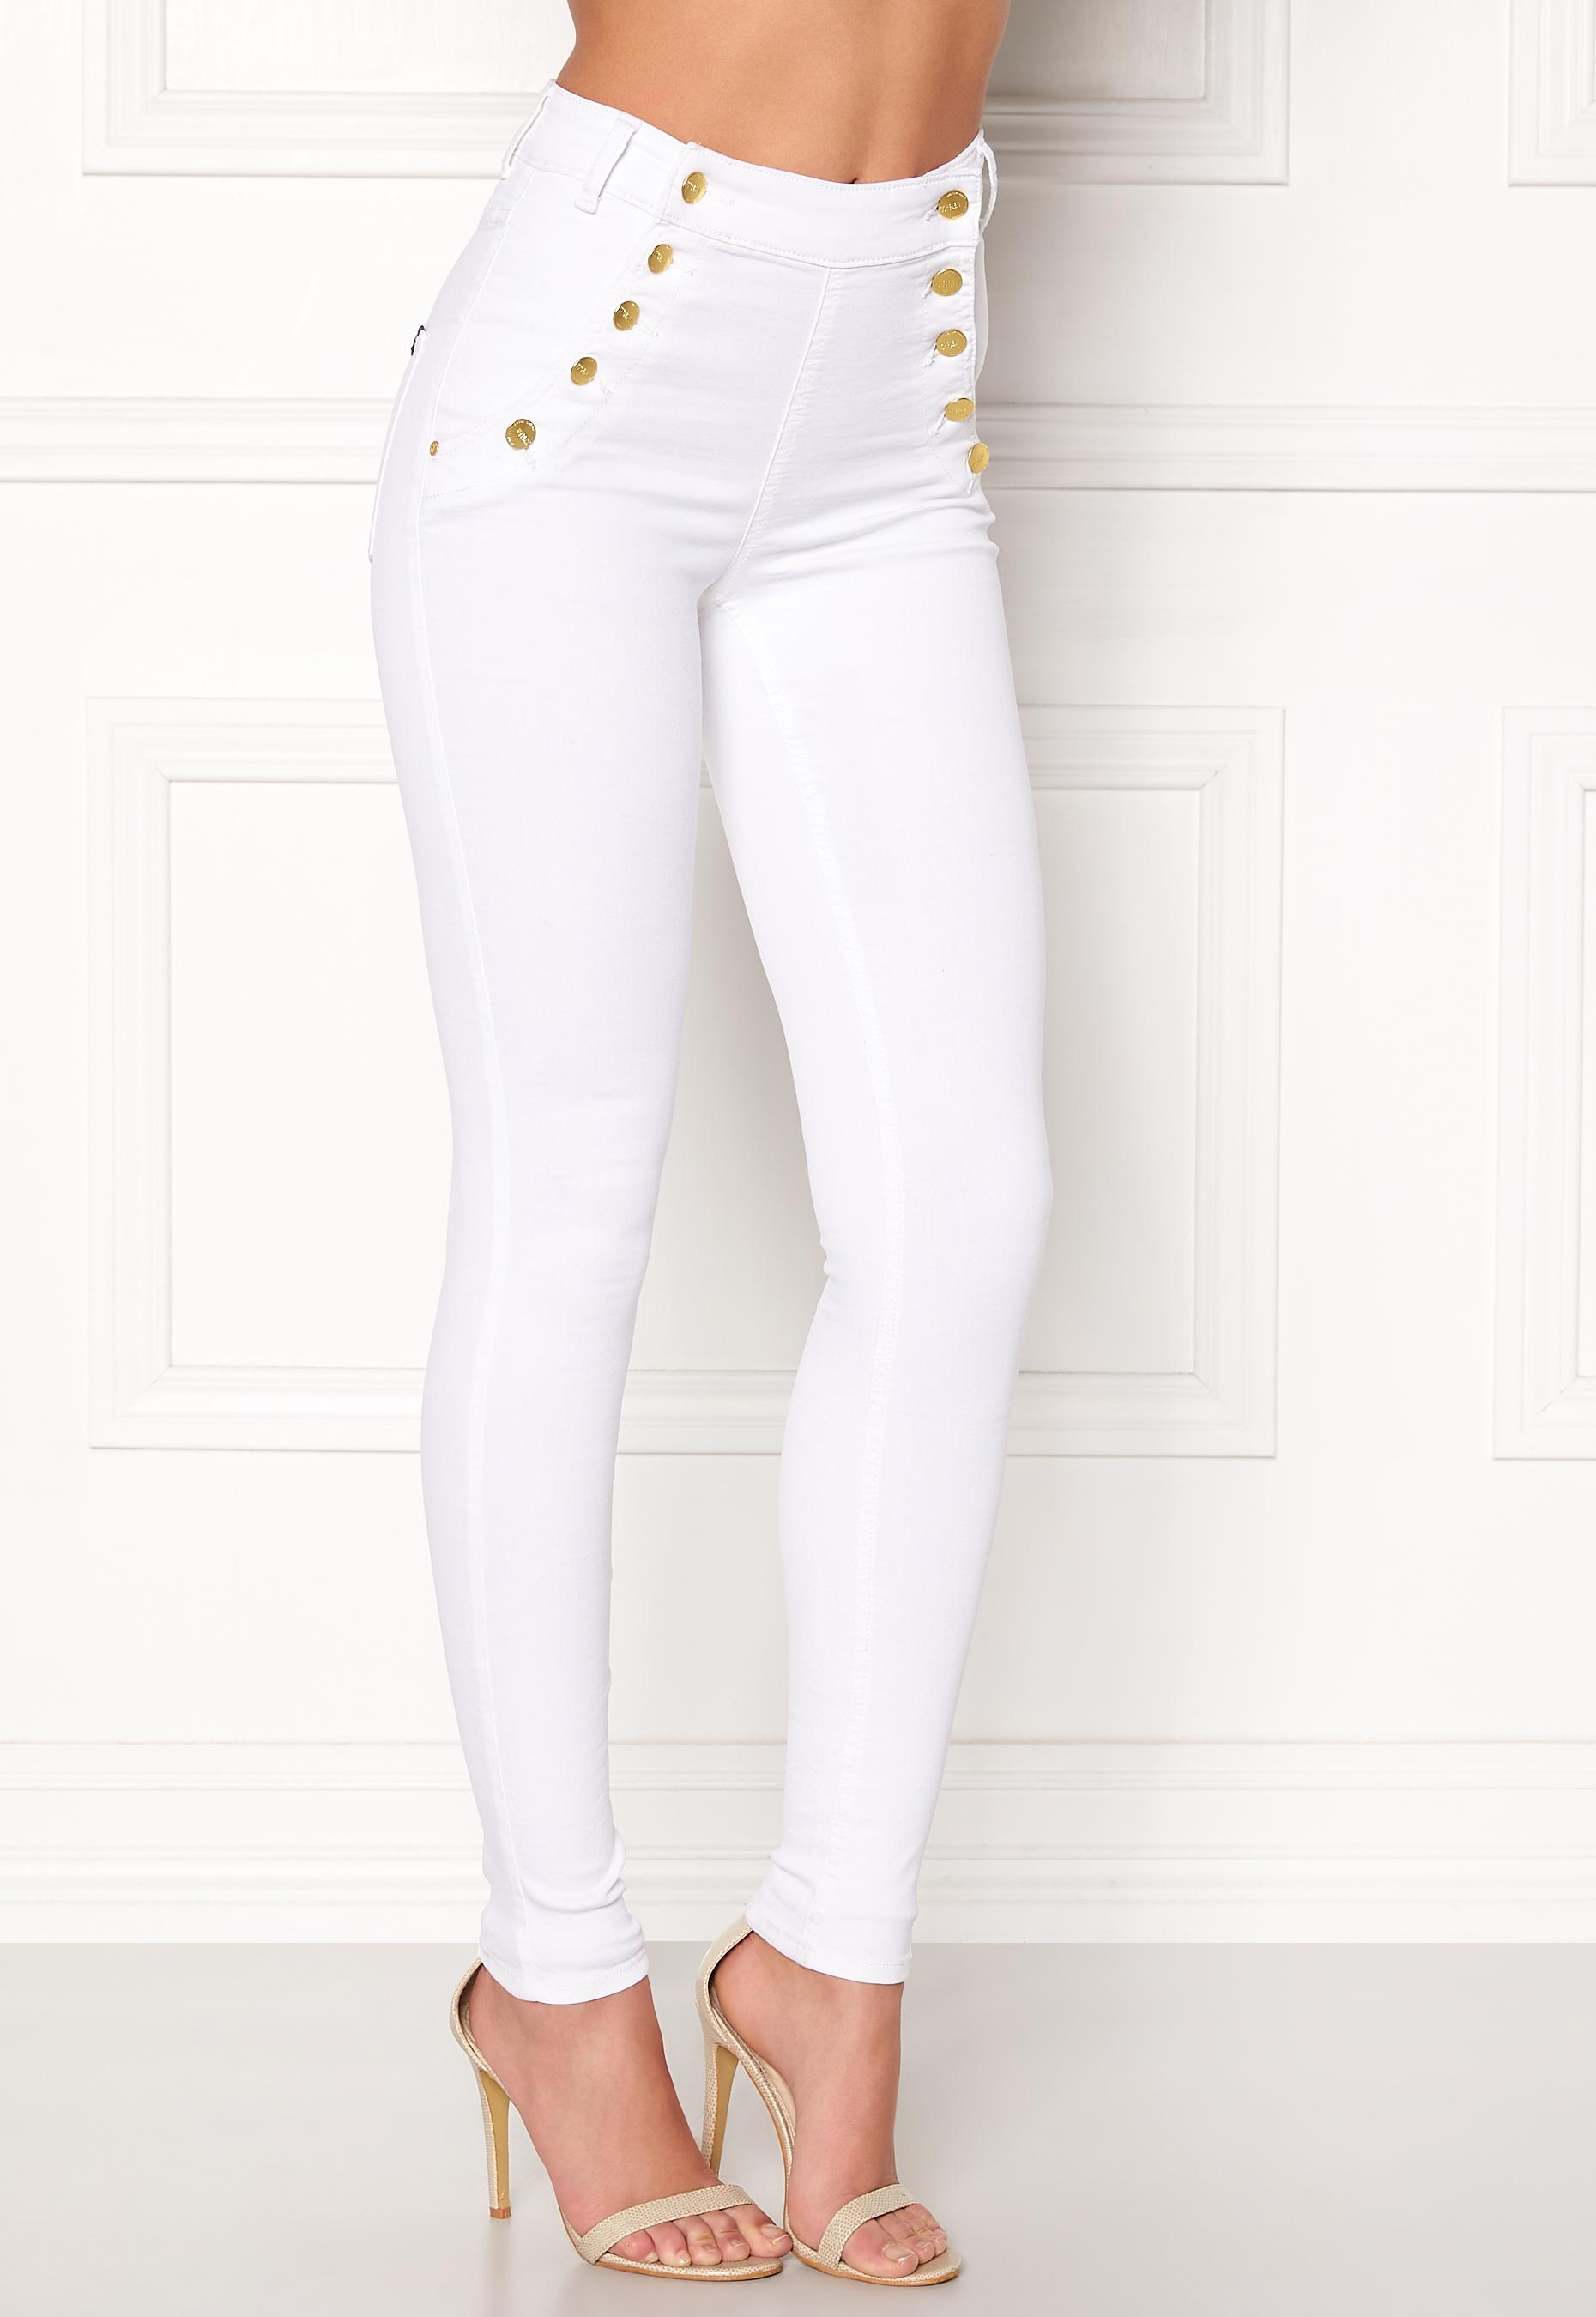 77thFLEA Adina highwaist jeans White - Bubbleroom e19ce99d61b53